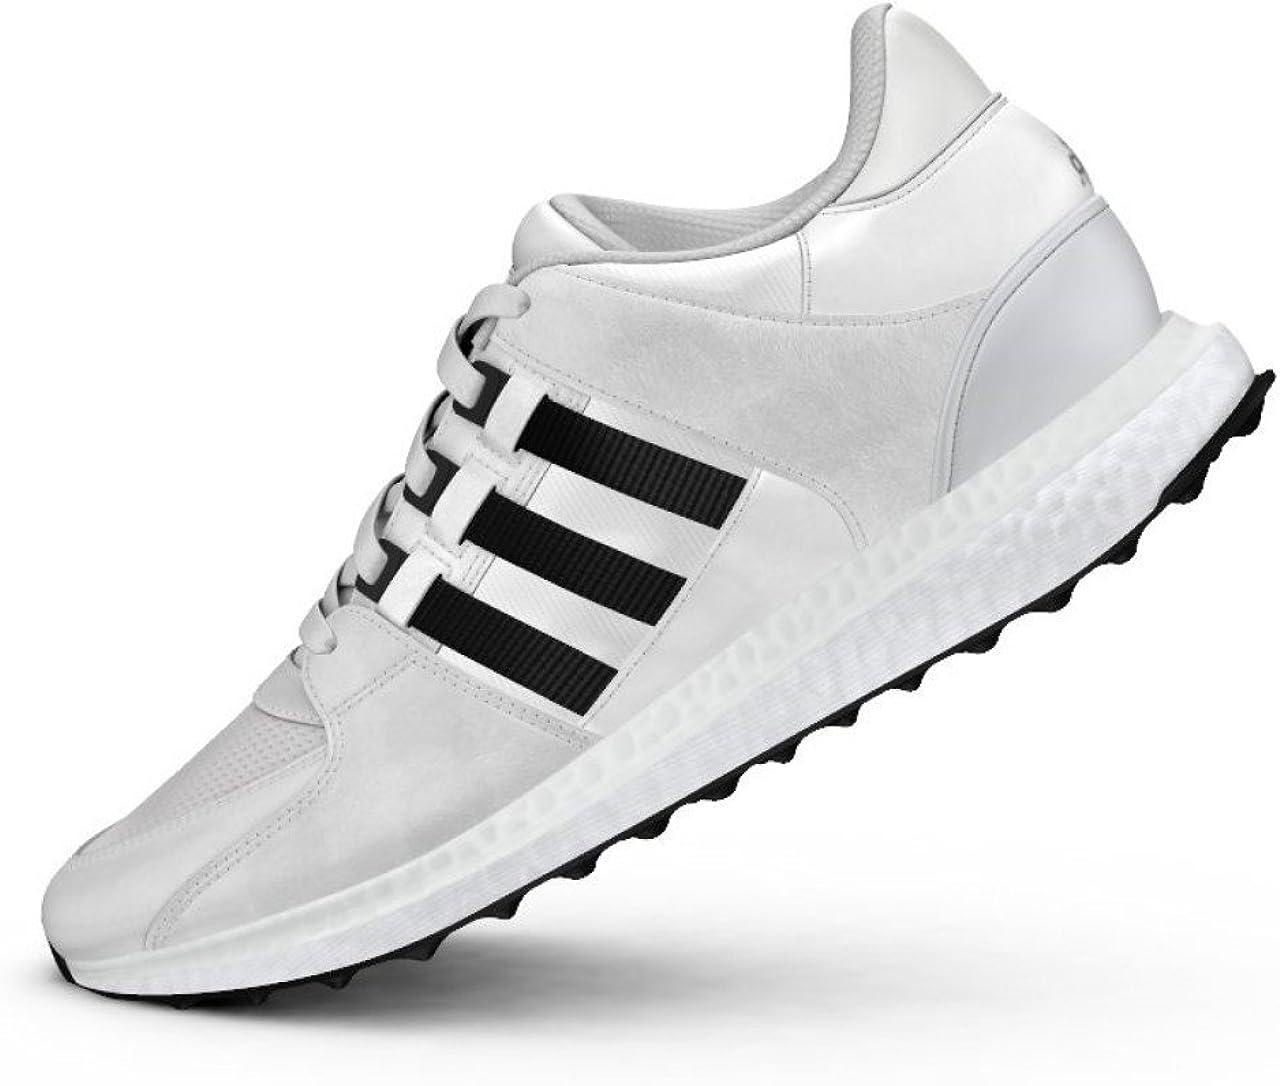 Adidas Eqt Support Rf Femme Vintage WhiteCore Black